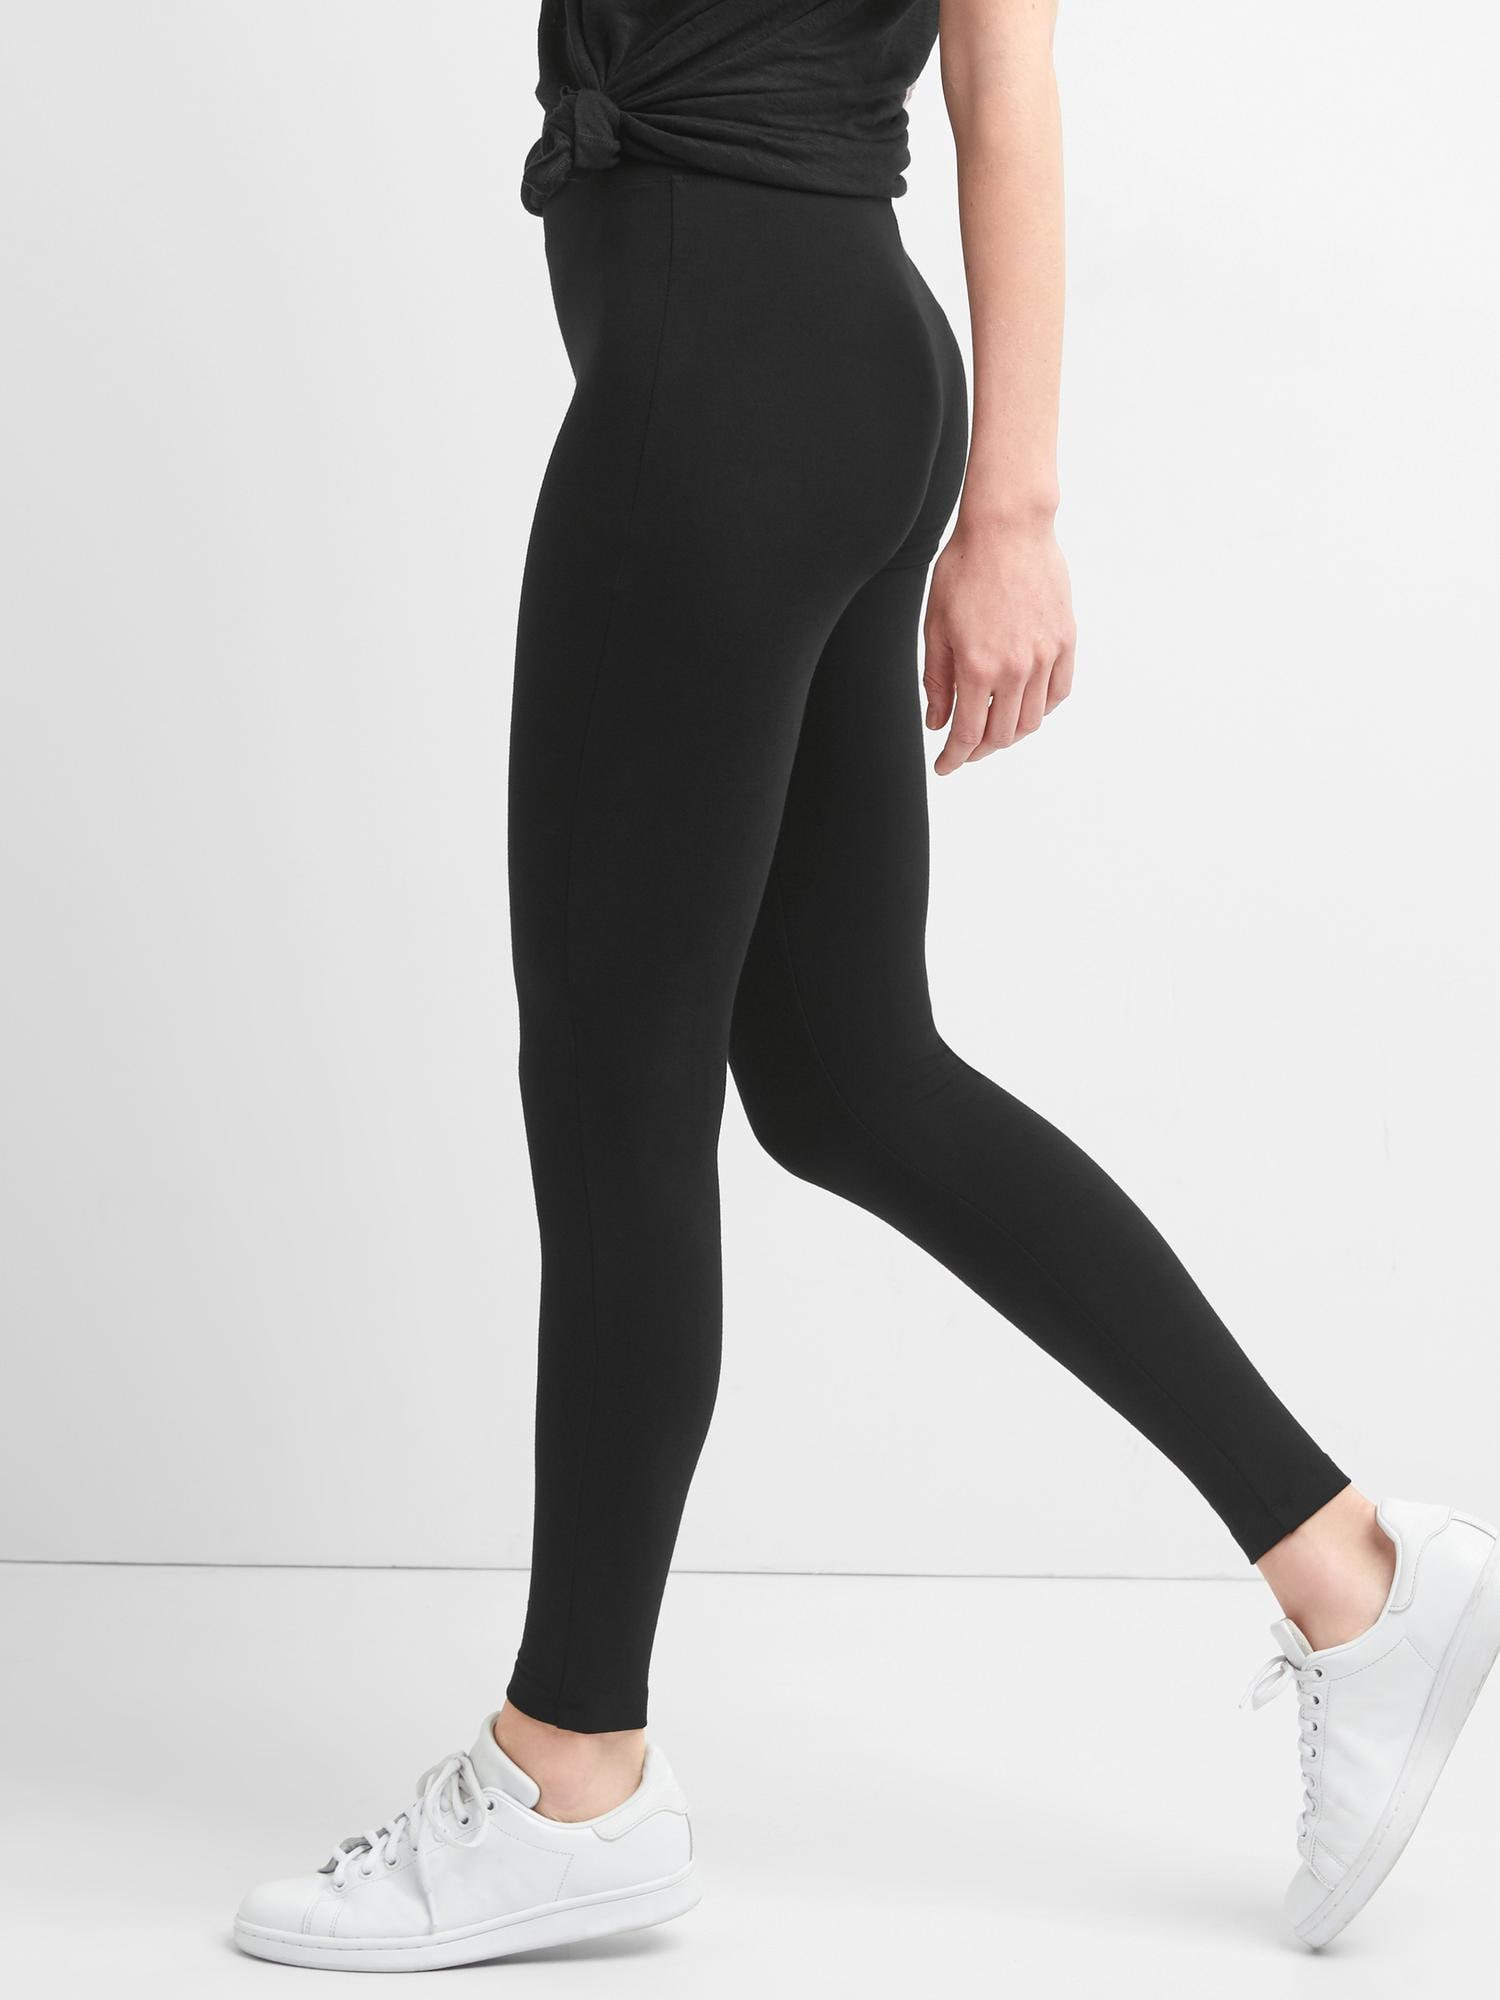 Basic Leggings Gap